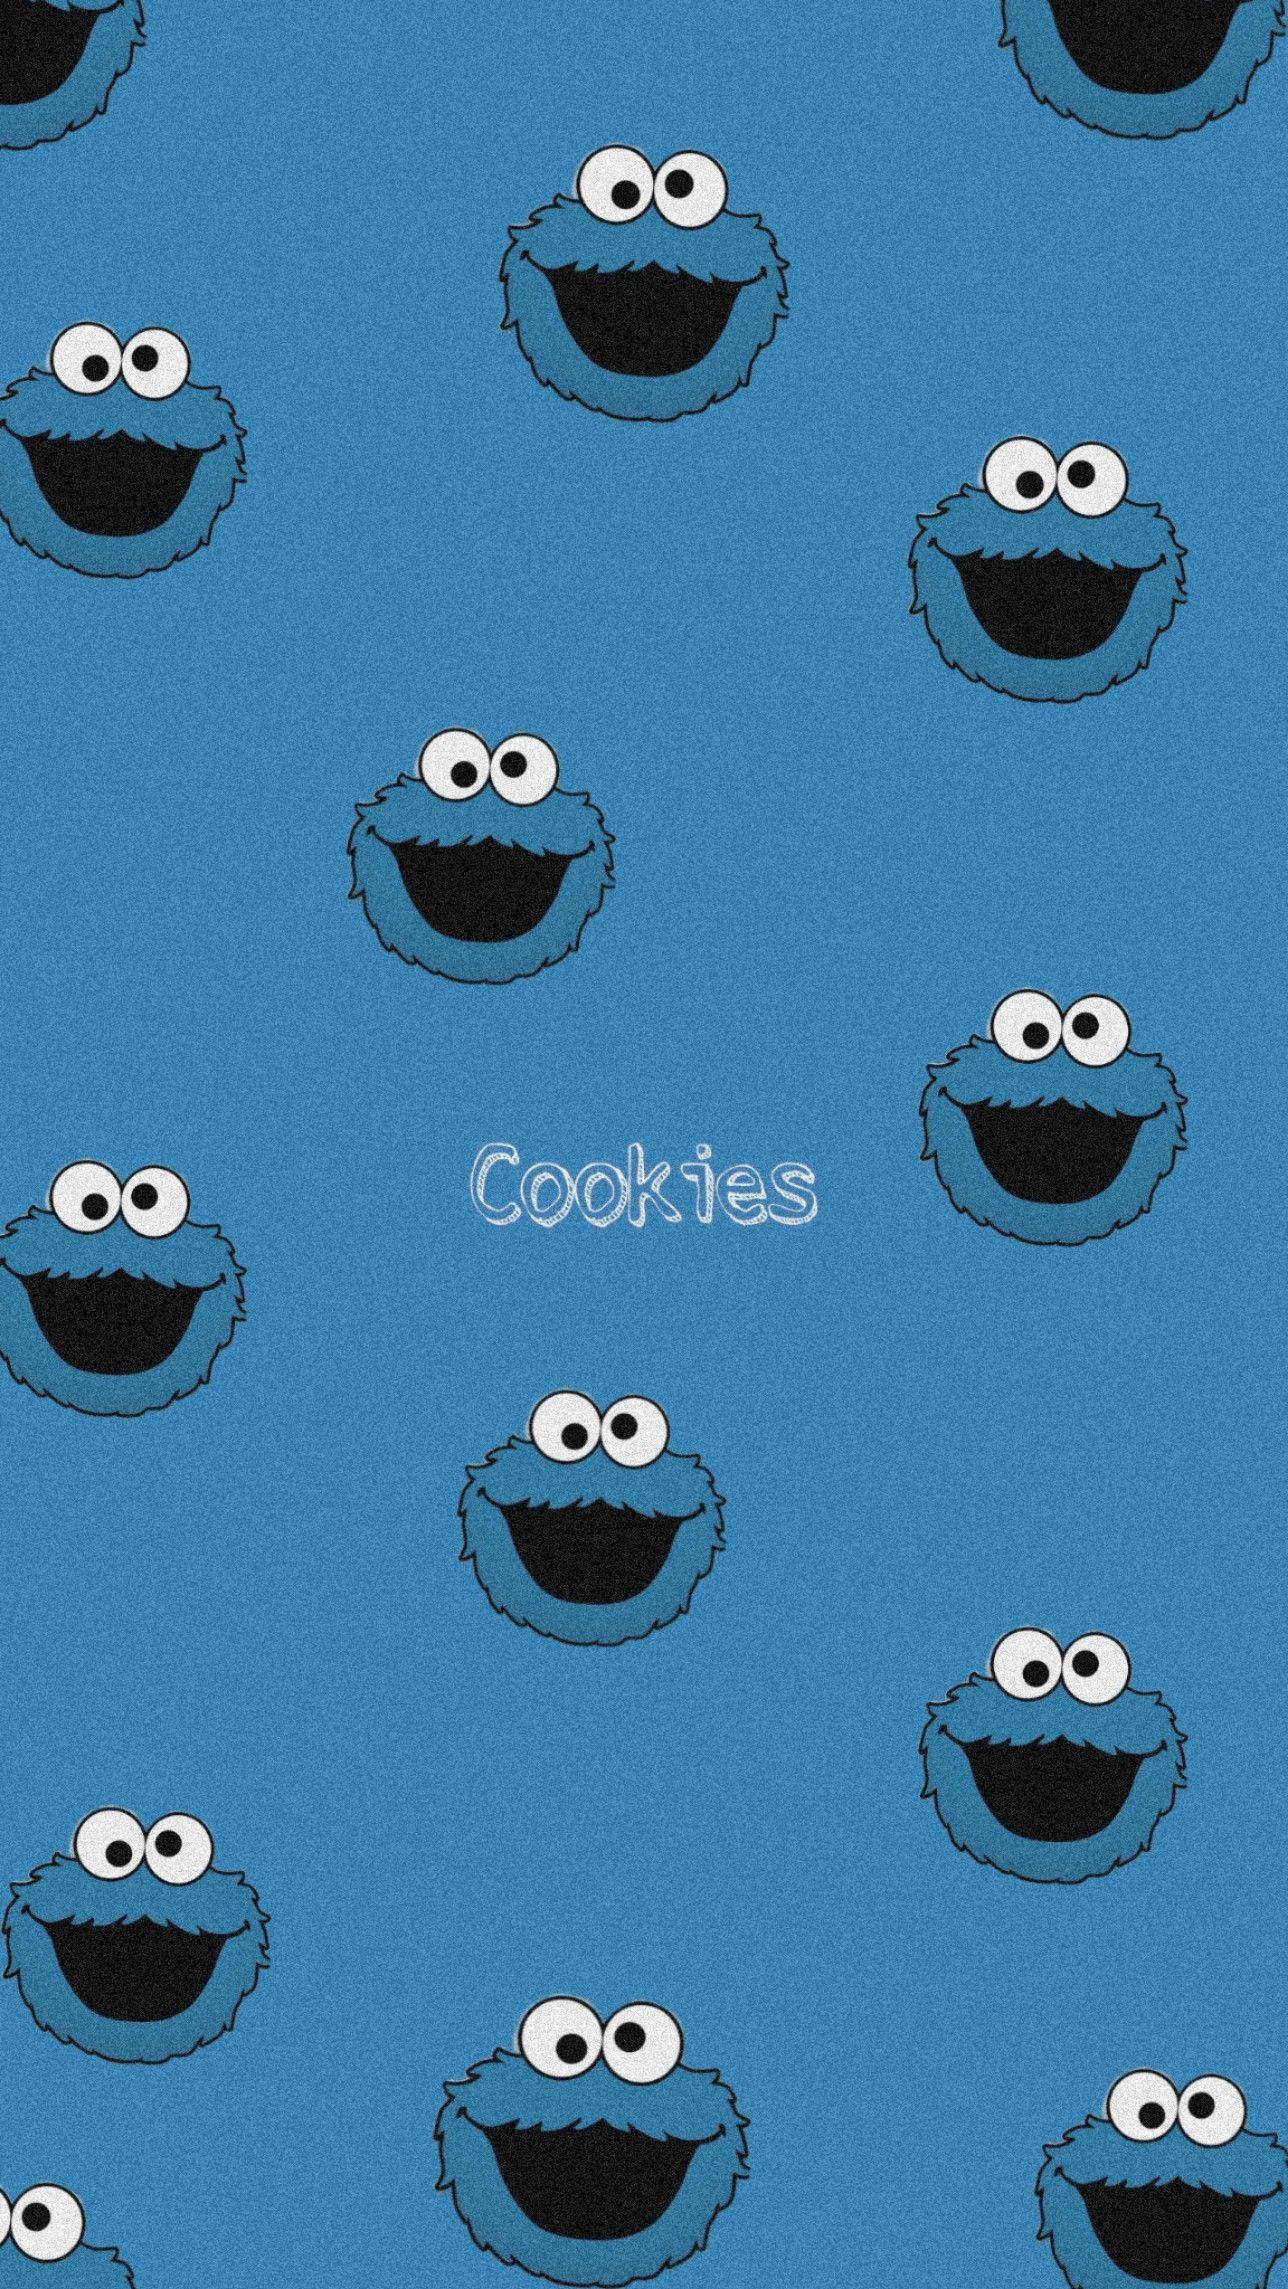 Wallpaper Fondo De Pantalla Cookie Monster Cookie Monster Wallpaper Elmo Wallpaper Monster Cookies